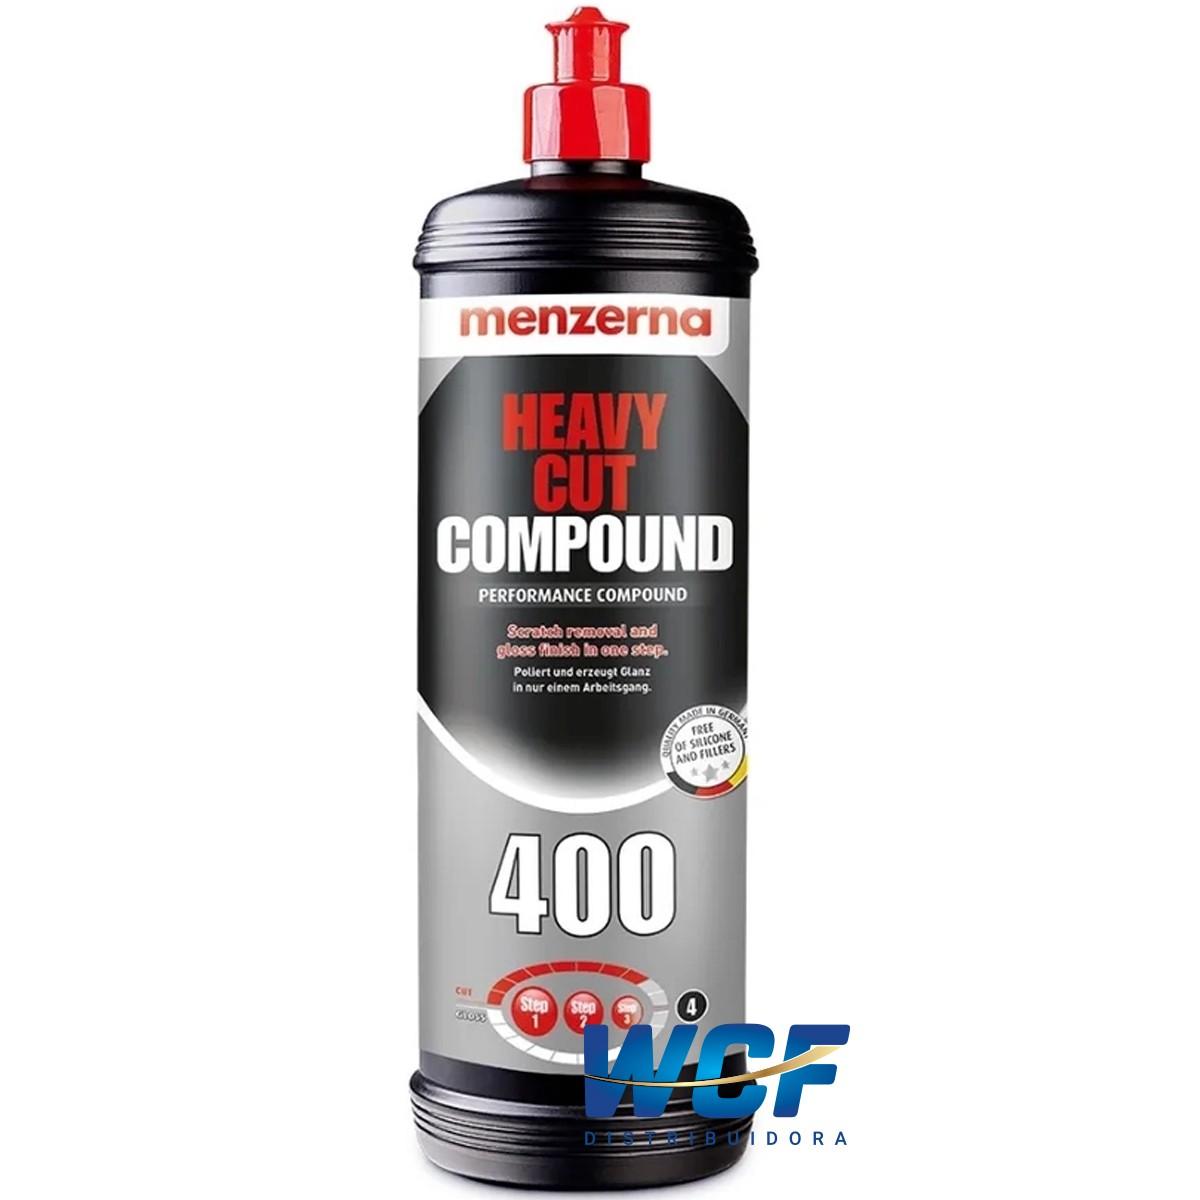 HEAVY CUT COMPOUND PERFORMANCE 400 1LT MENZERNA